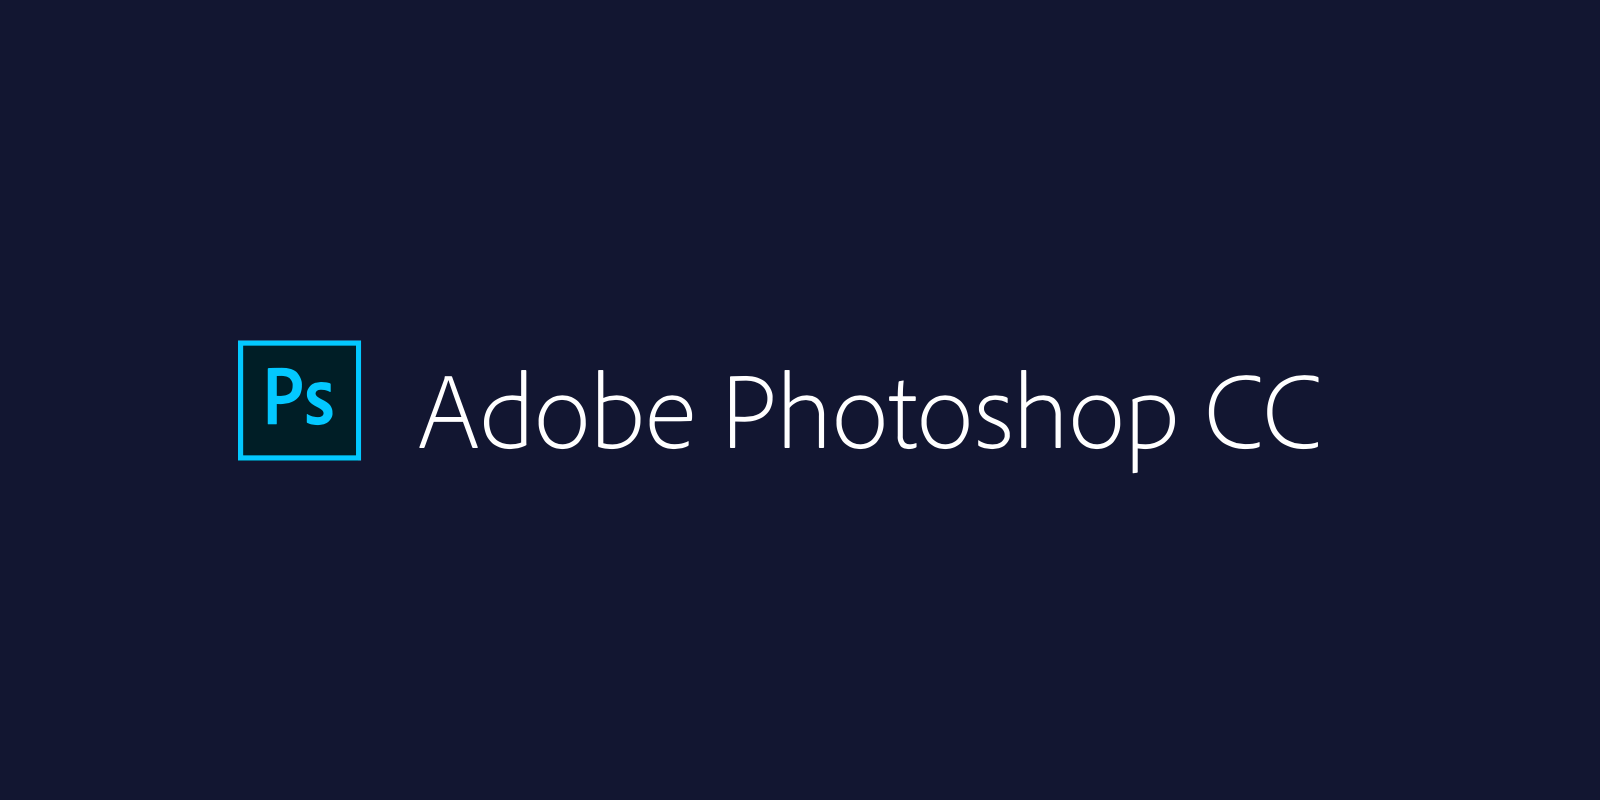 Adobe Photoshop - DeaqonJames Photography Tutorials